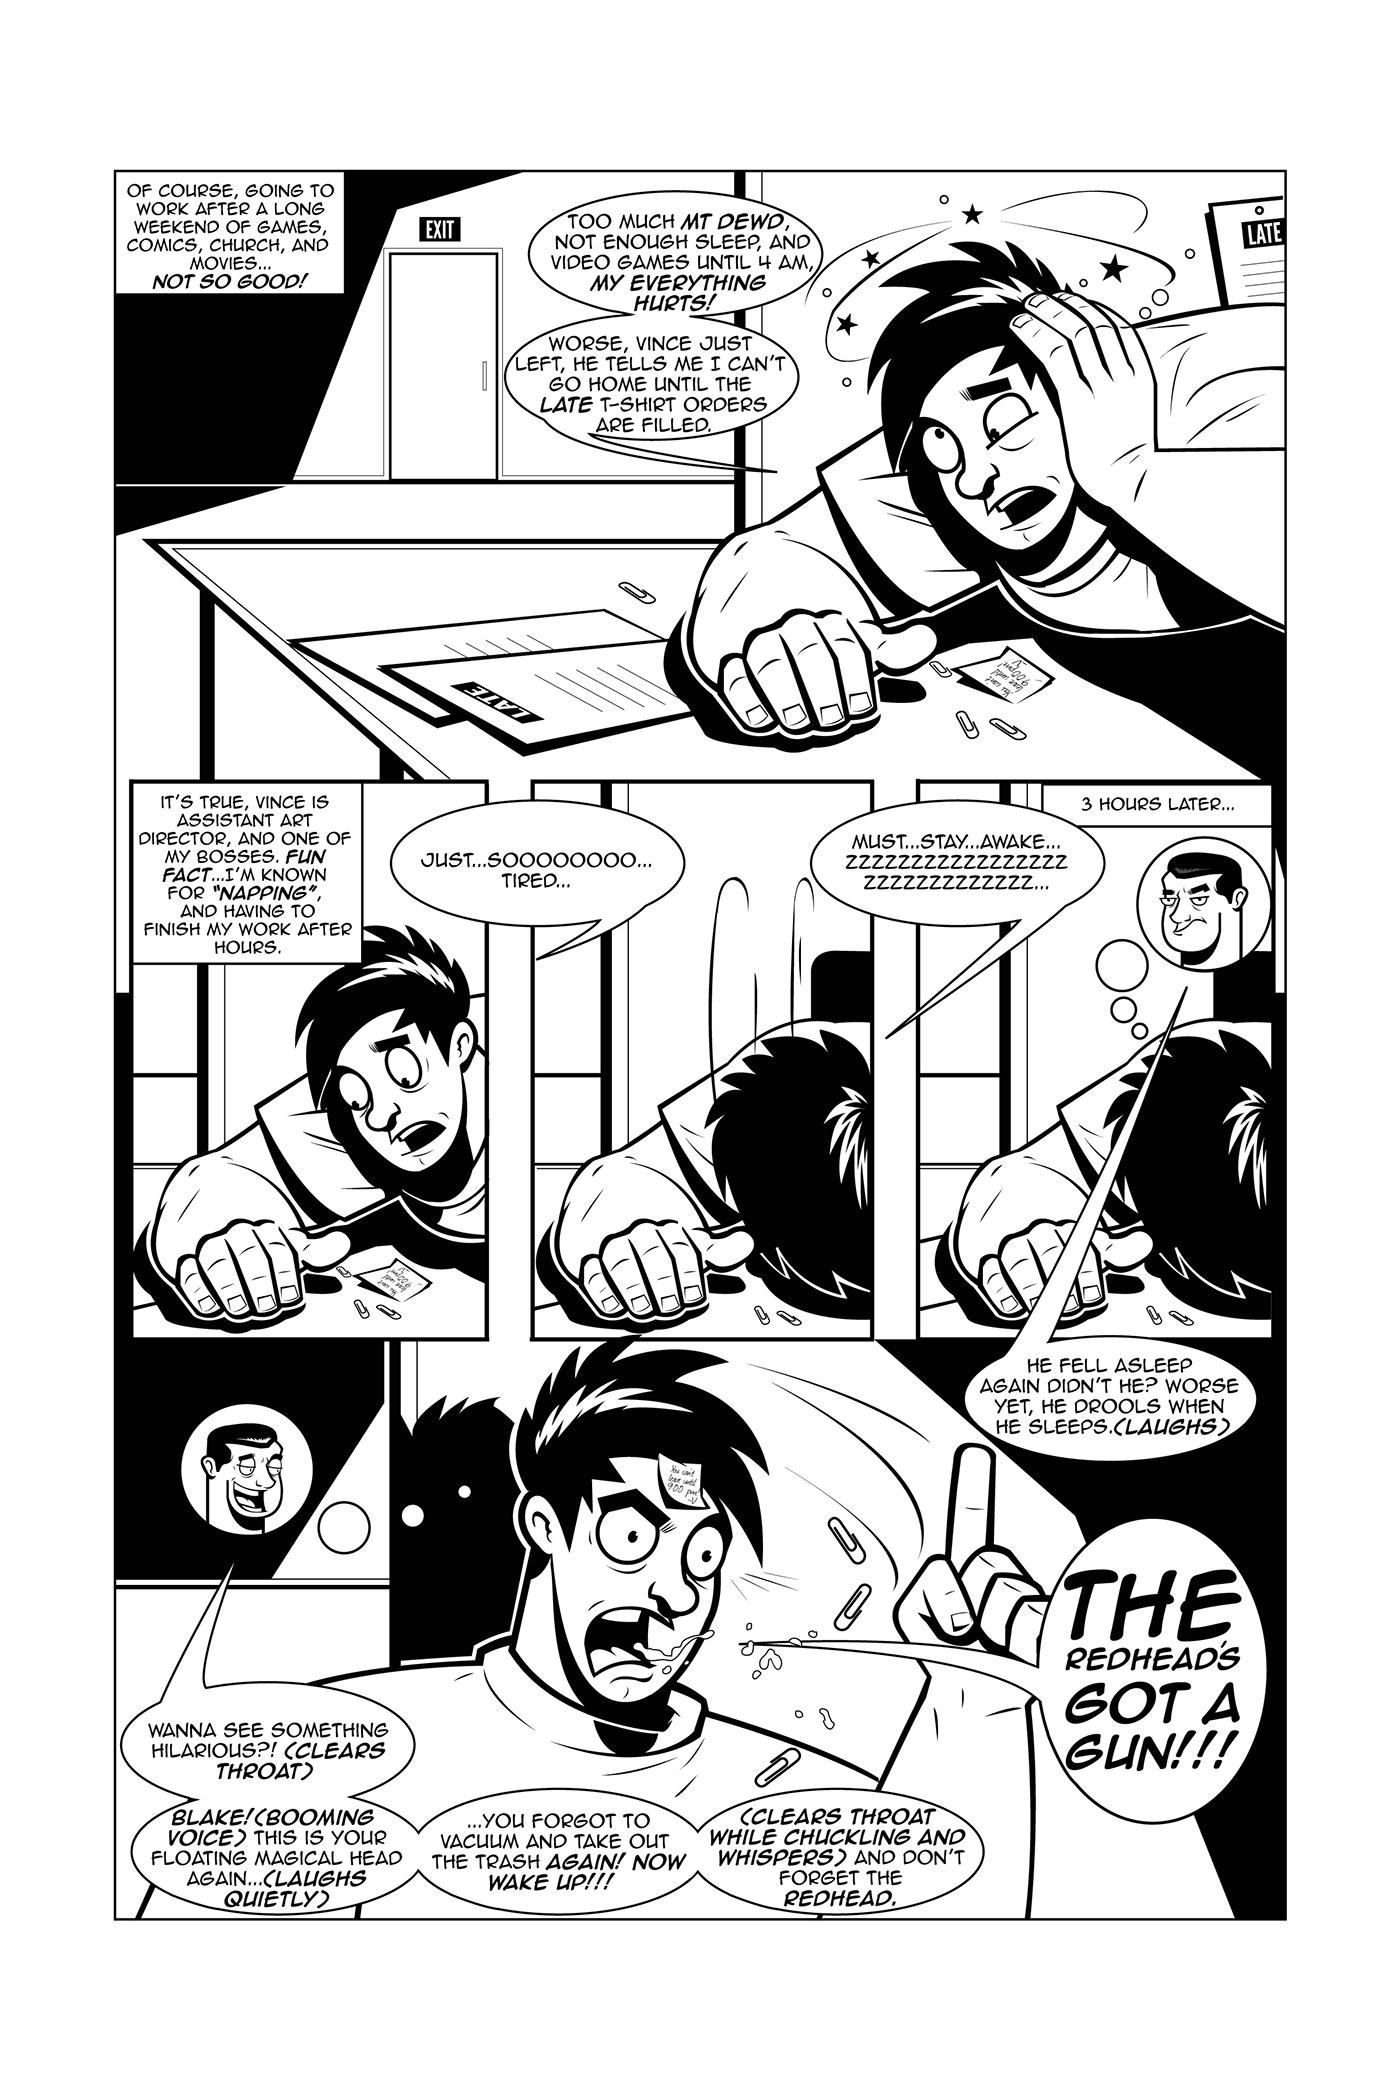 Image may contain: cartoon, comic and book